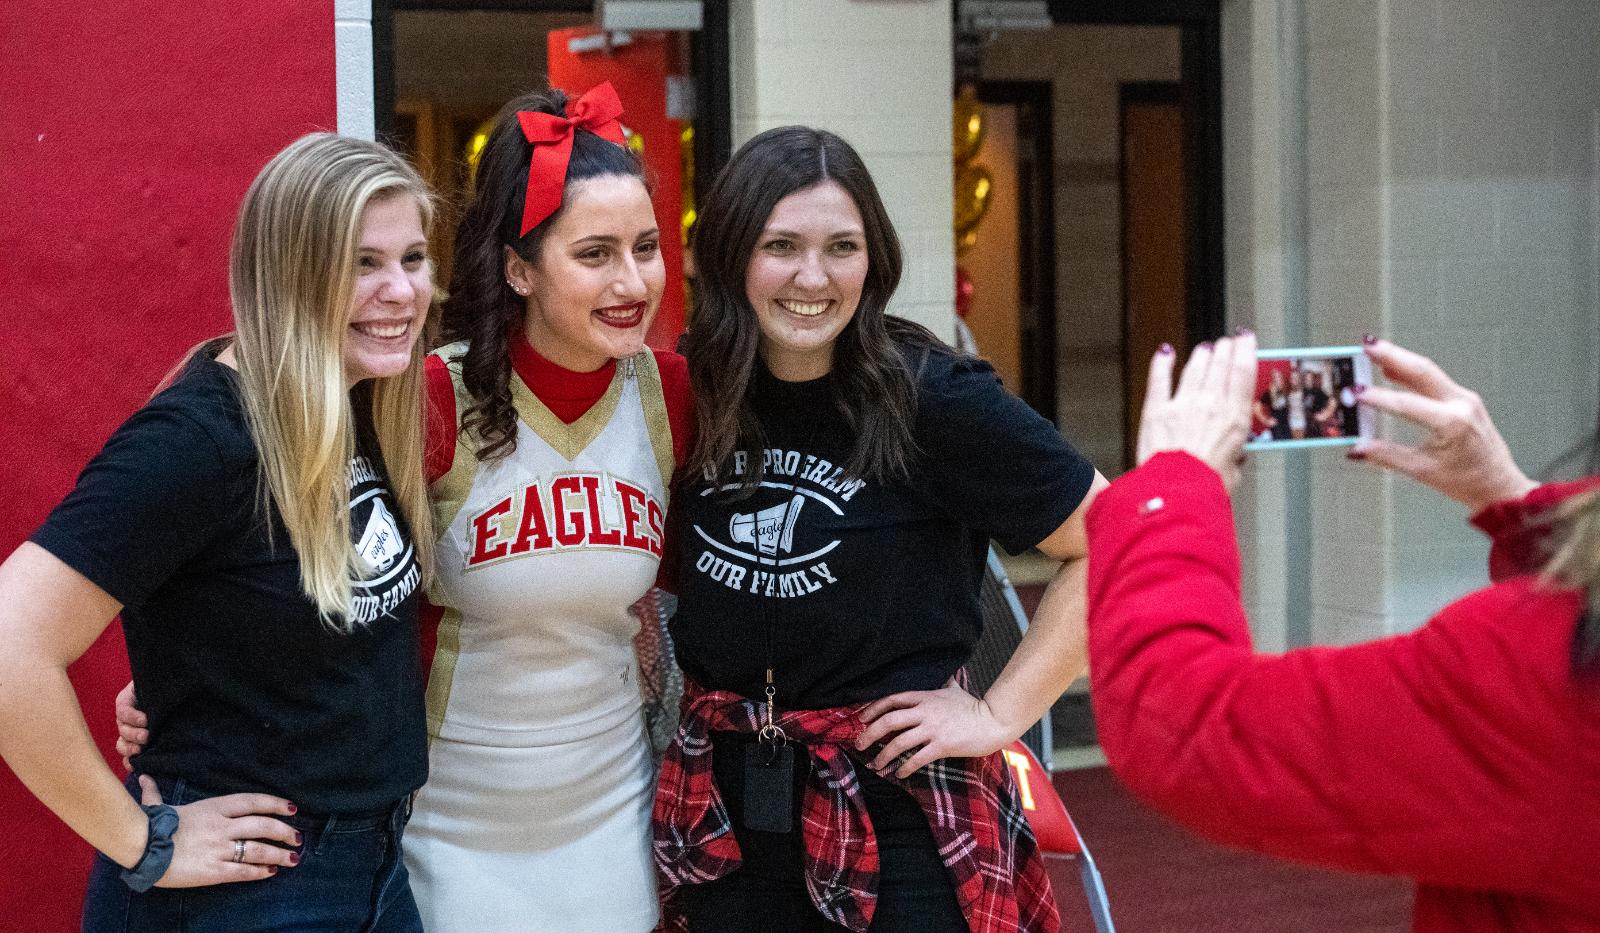 PHOTO GALLERY: Big Walnut cheerleaders' virtual performance